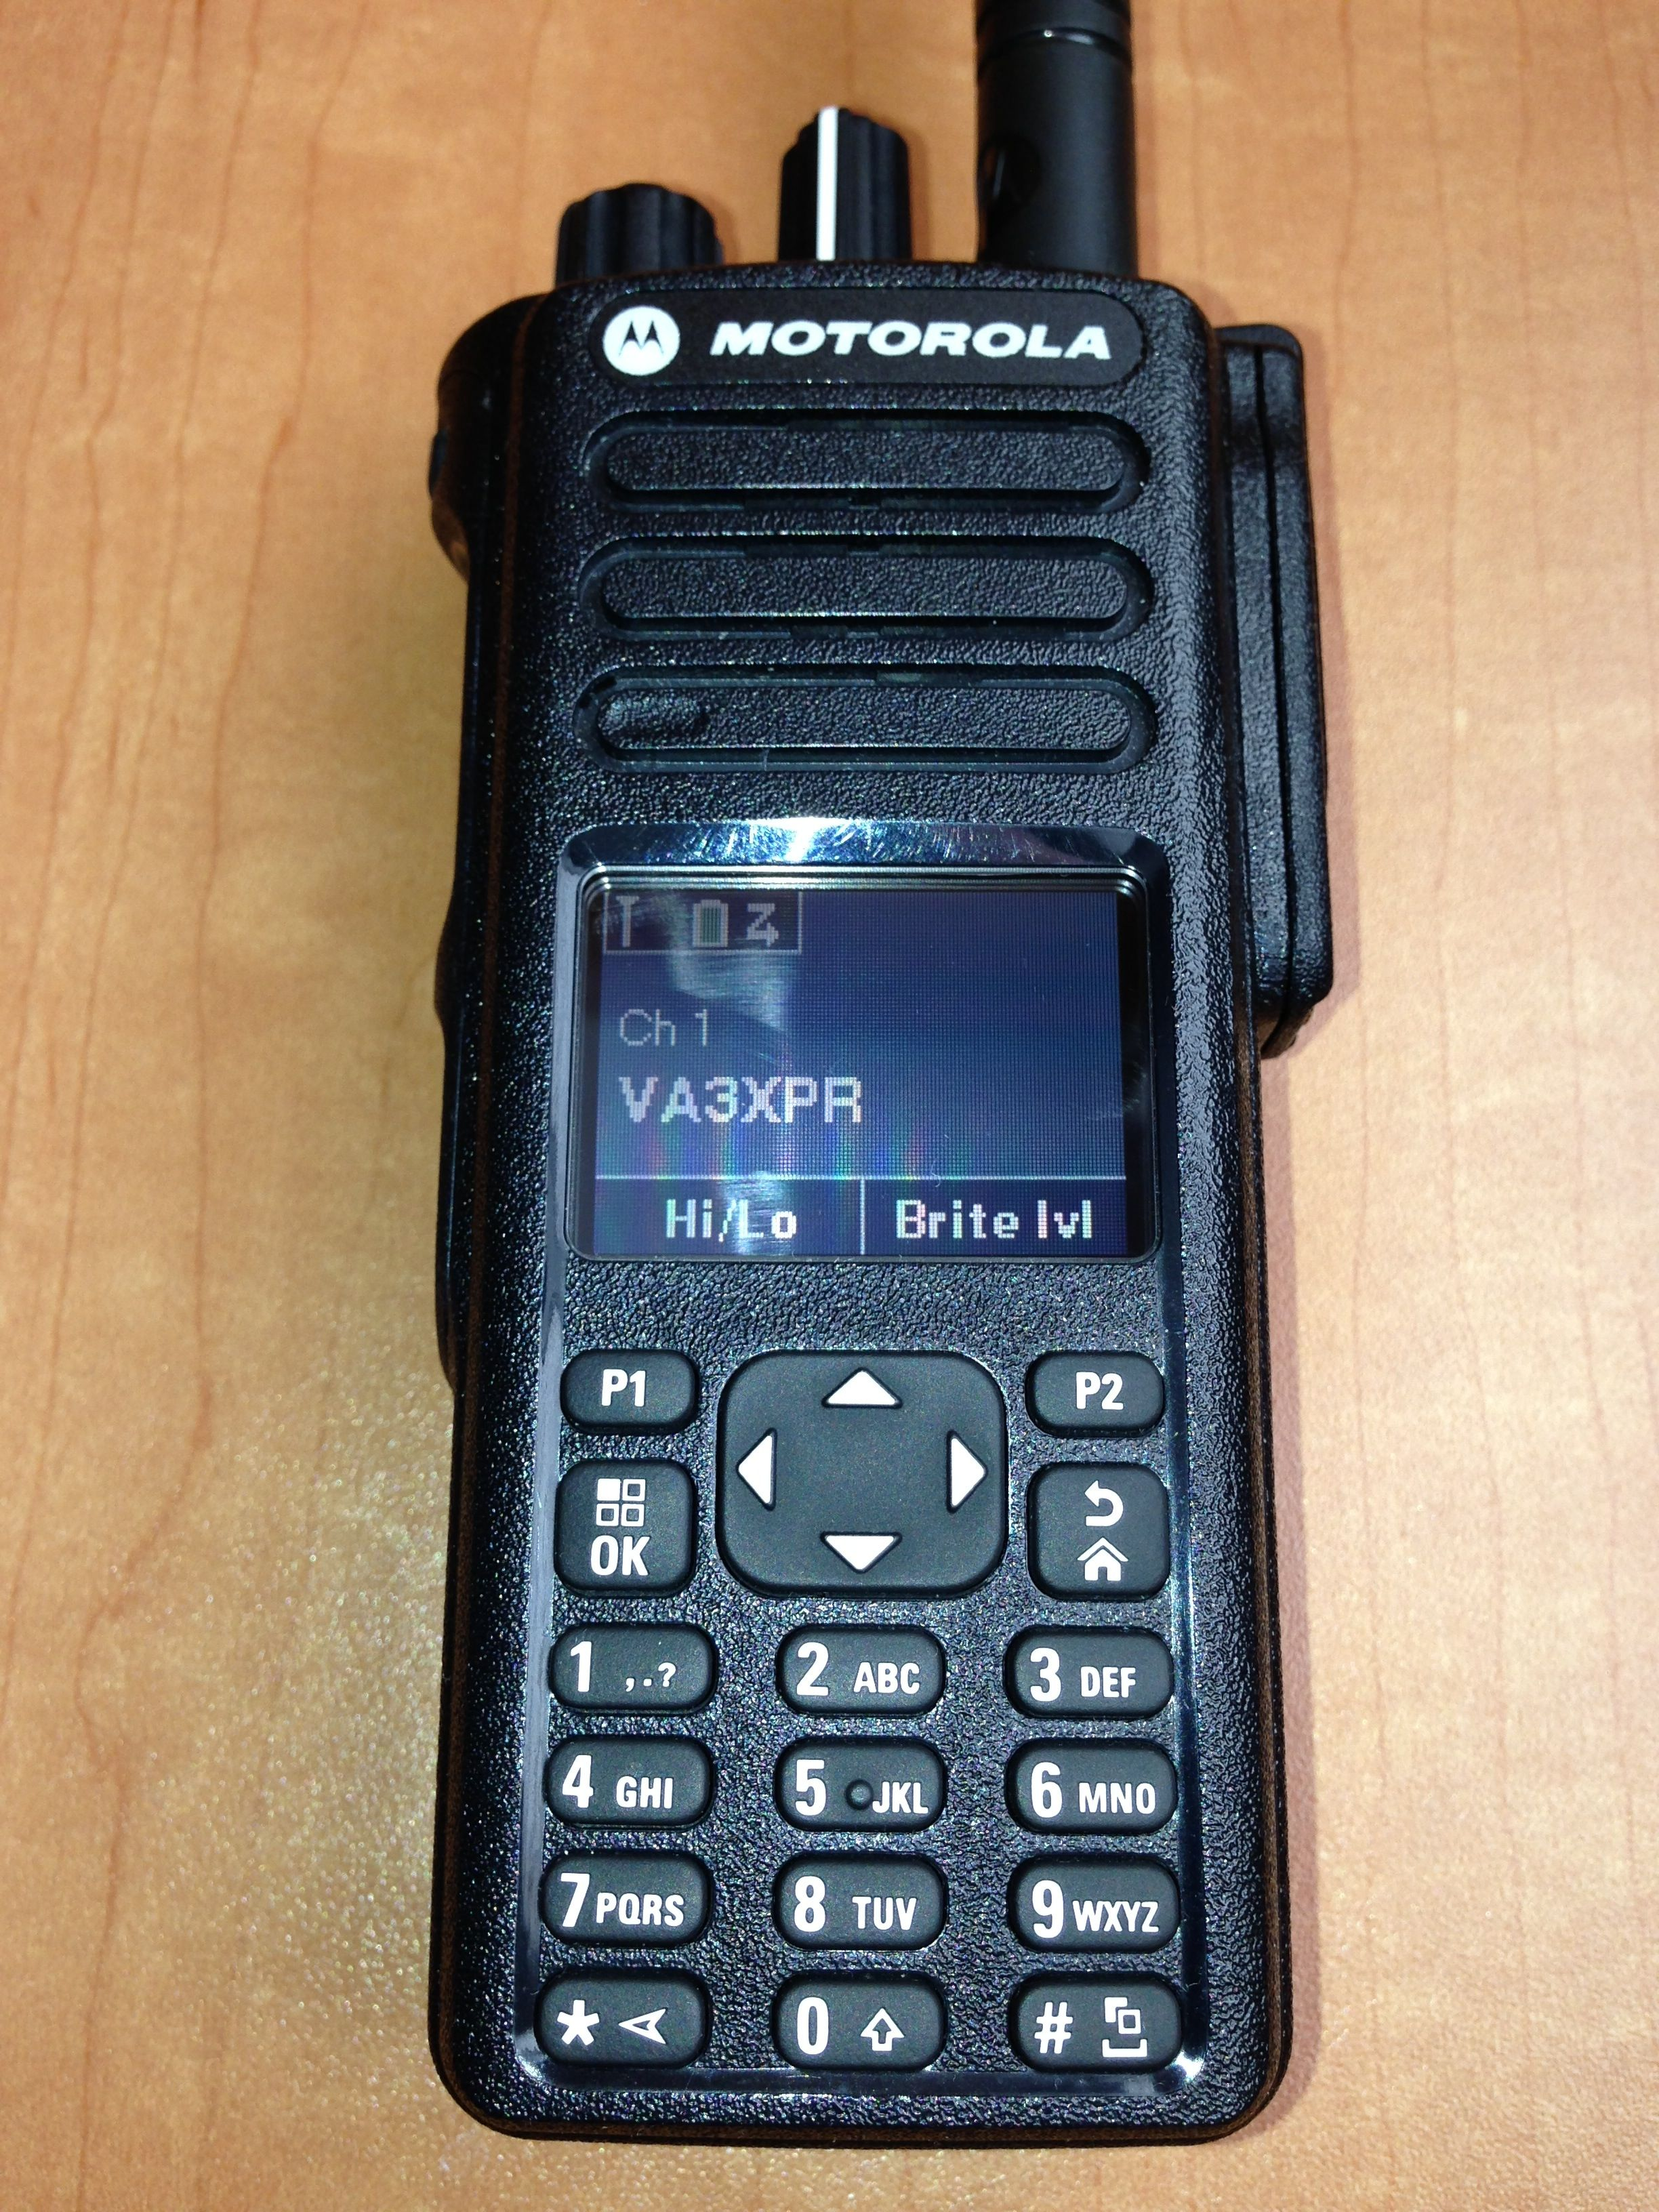 motorola 4000 radio. va3xpr, motorola, mototrbo, xpr7550, xpr 7550, portable, digital mobile radio motorola 4000